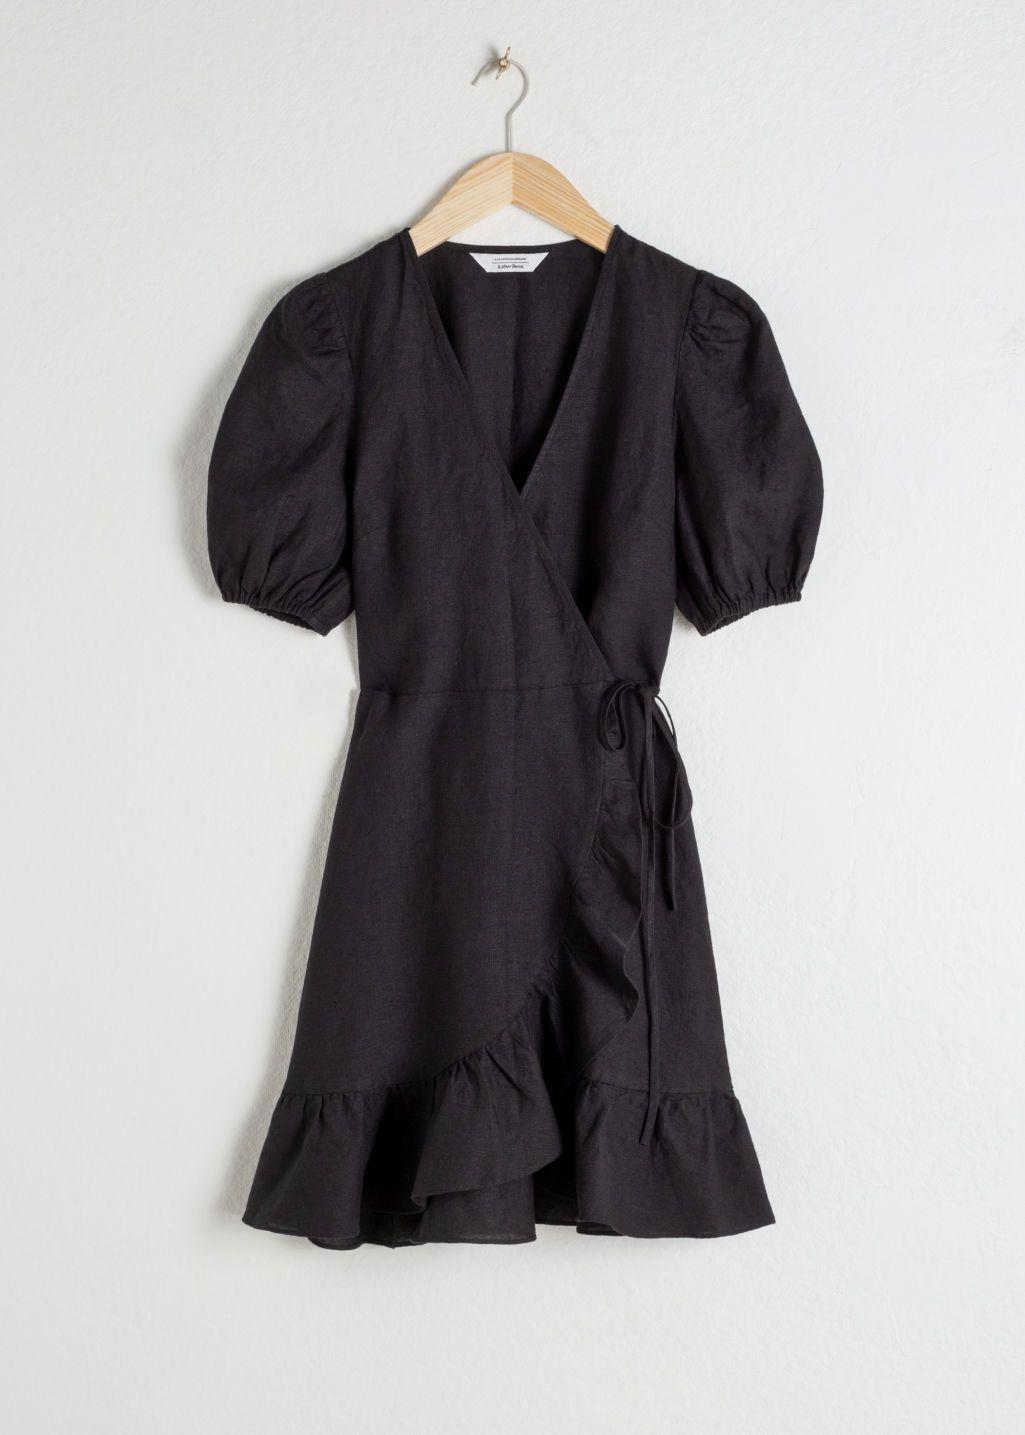 Puff Sleeve Linen Wrap Mini Dress Mini Wrap Dress Mini Dress With Sleeves Mini Dress [ 1435 x 1025 Pixel ]